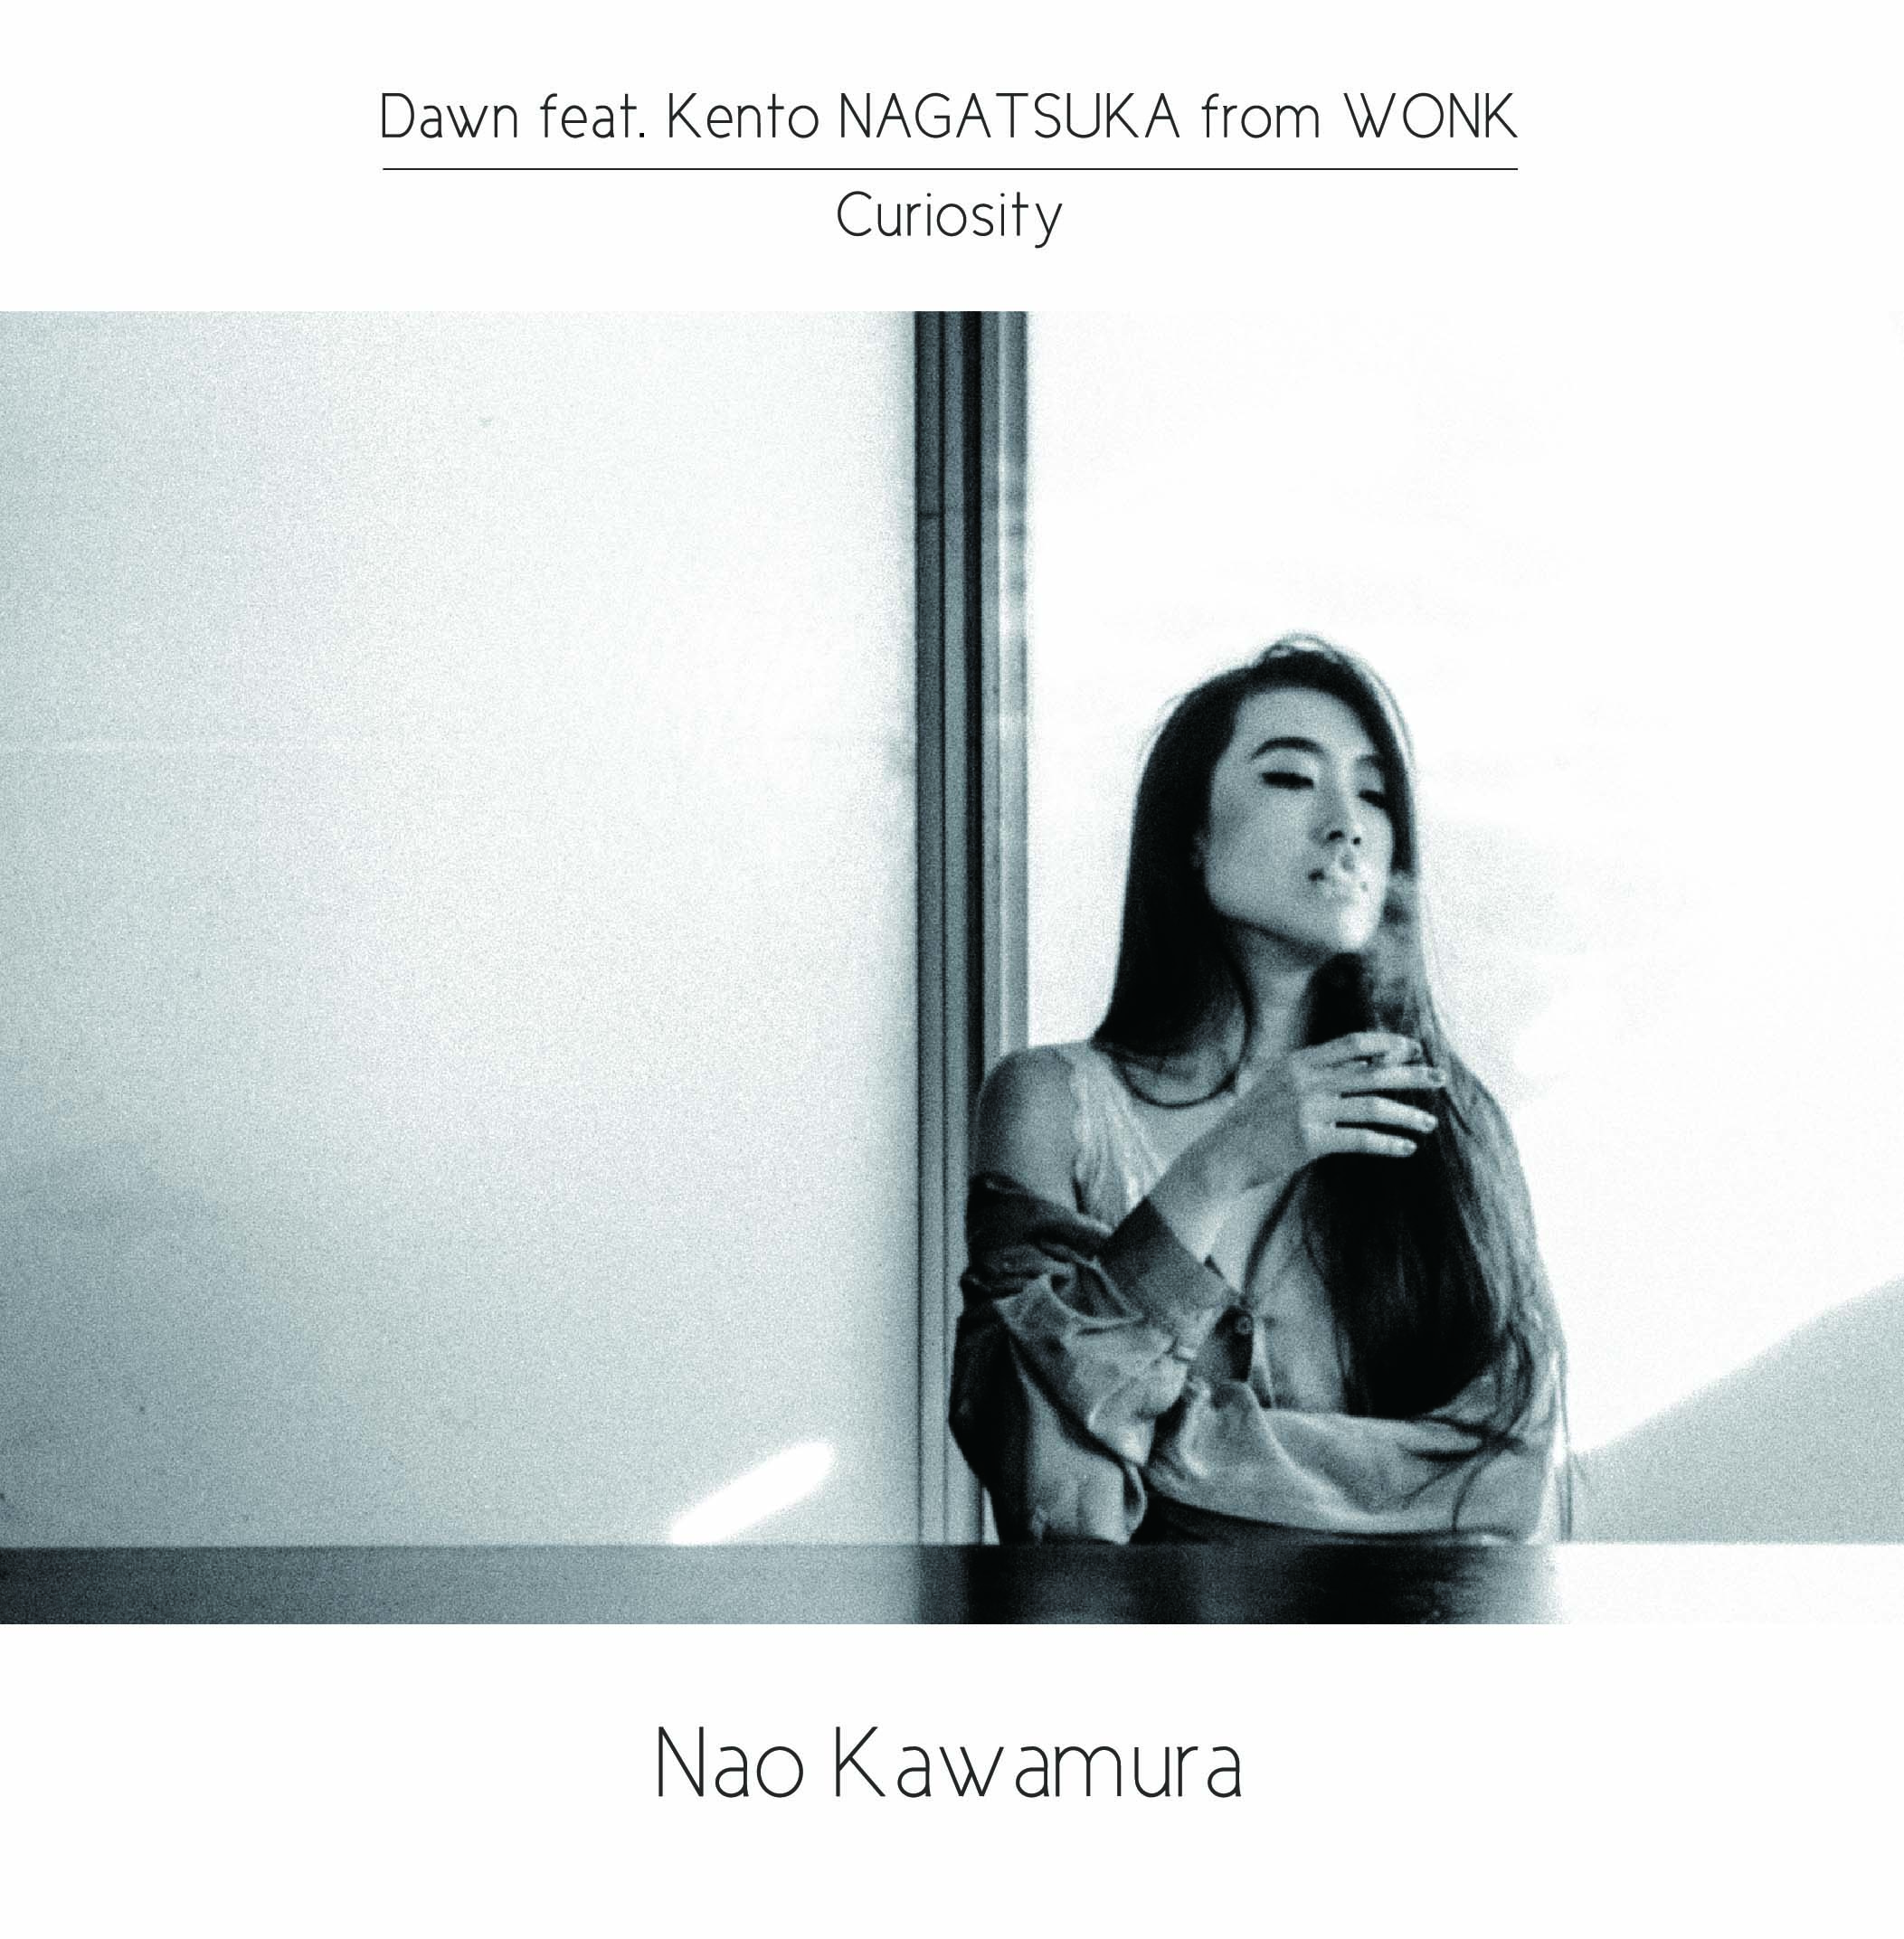 08-026 Nao Kawamura Dawn feat. Kento NAGATSUKA from WONK / Curiosity